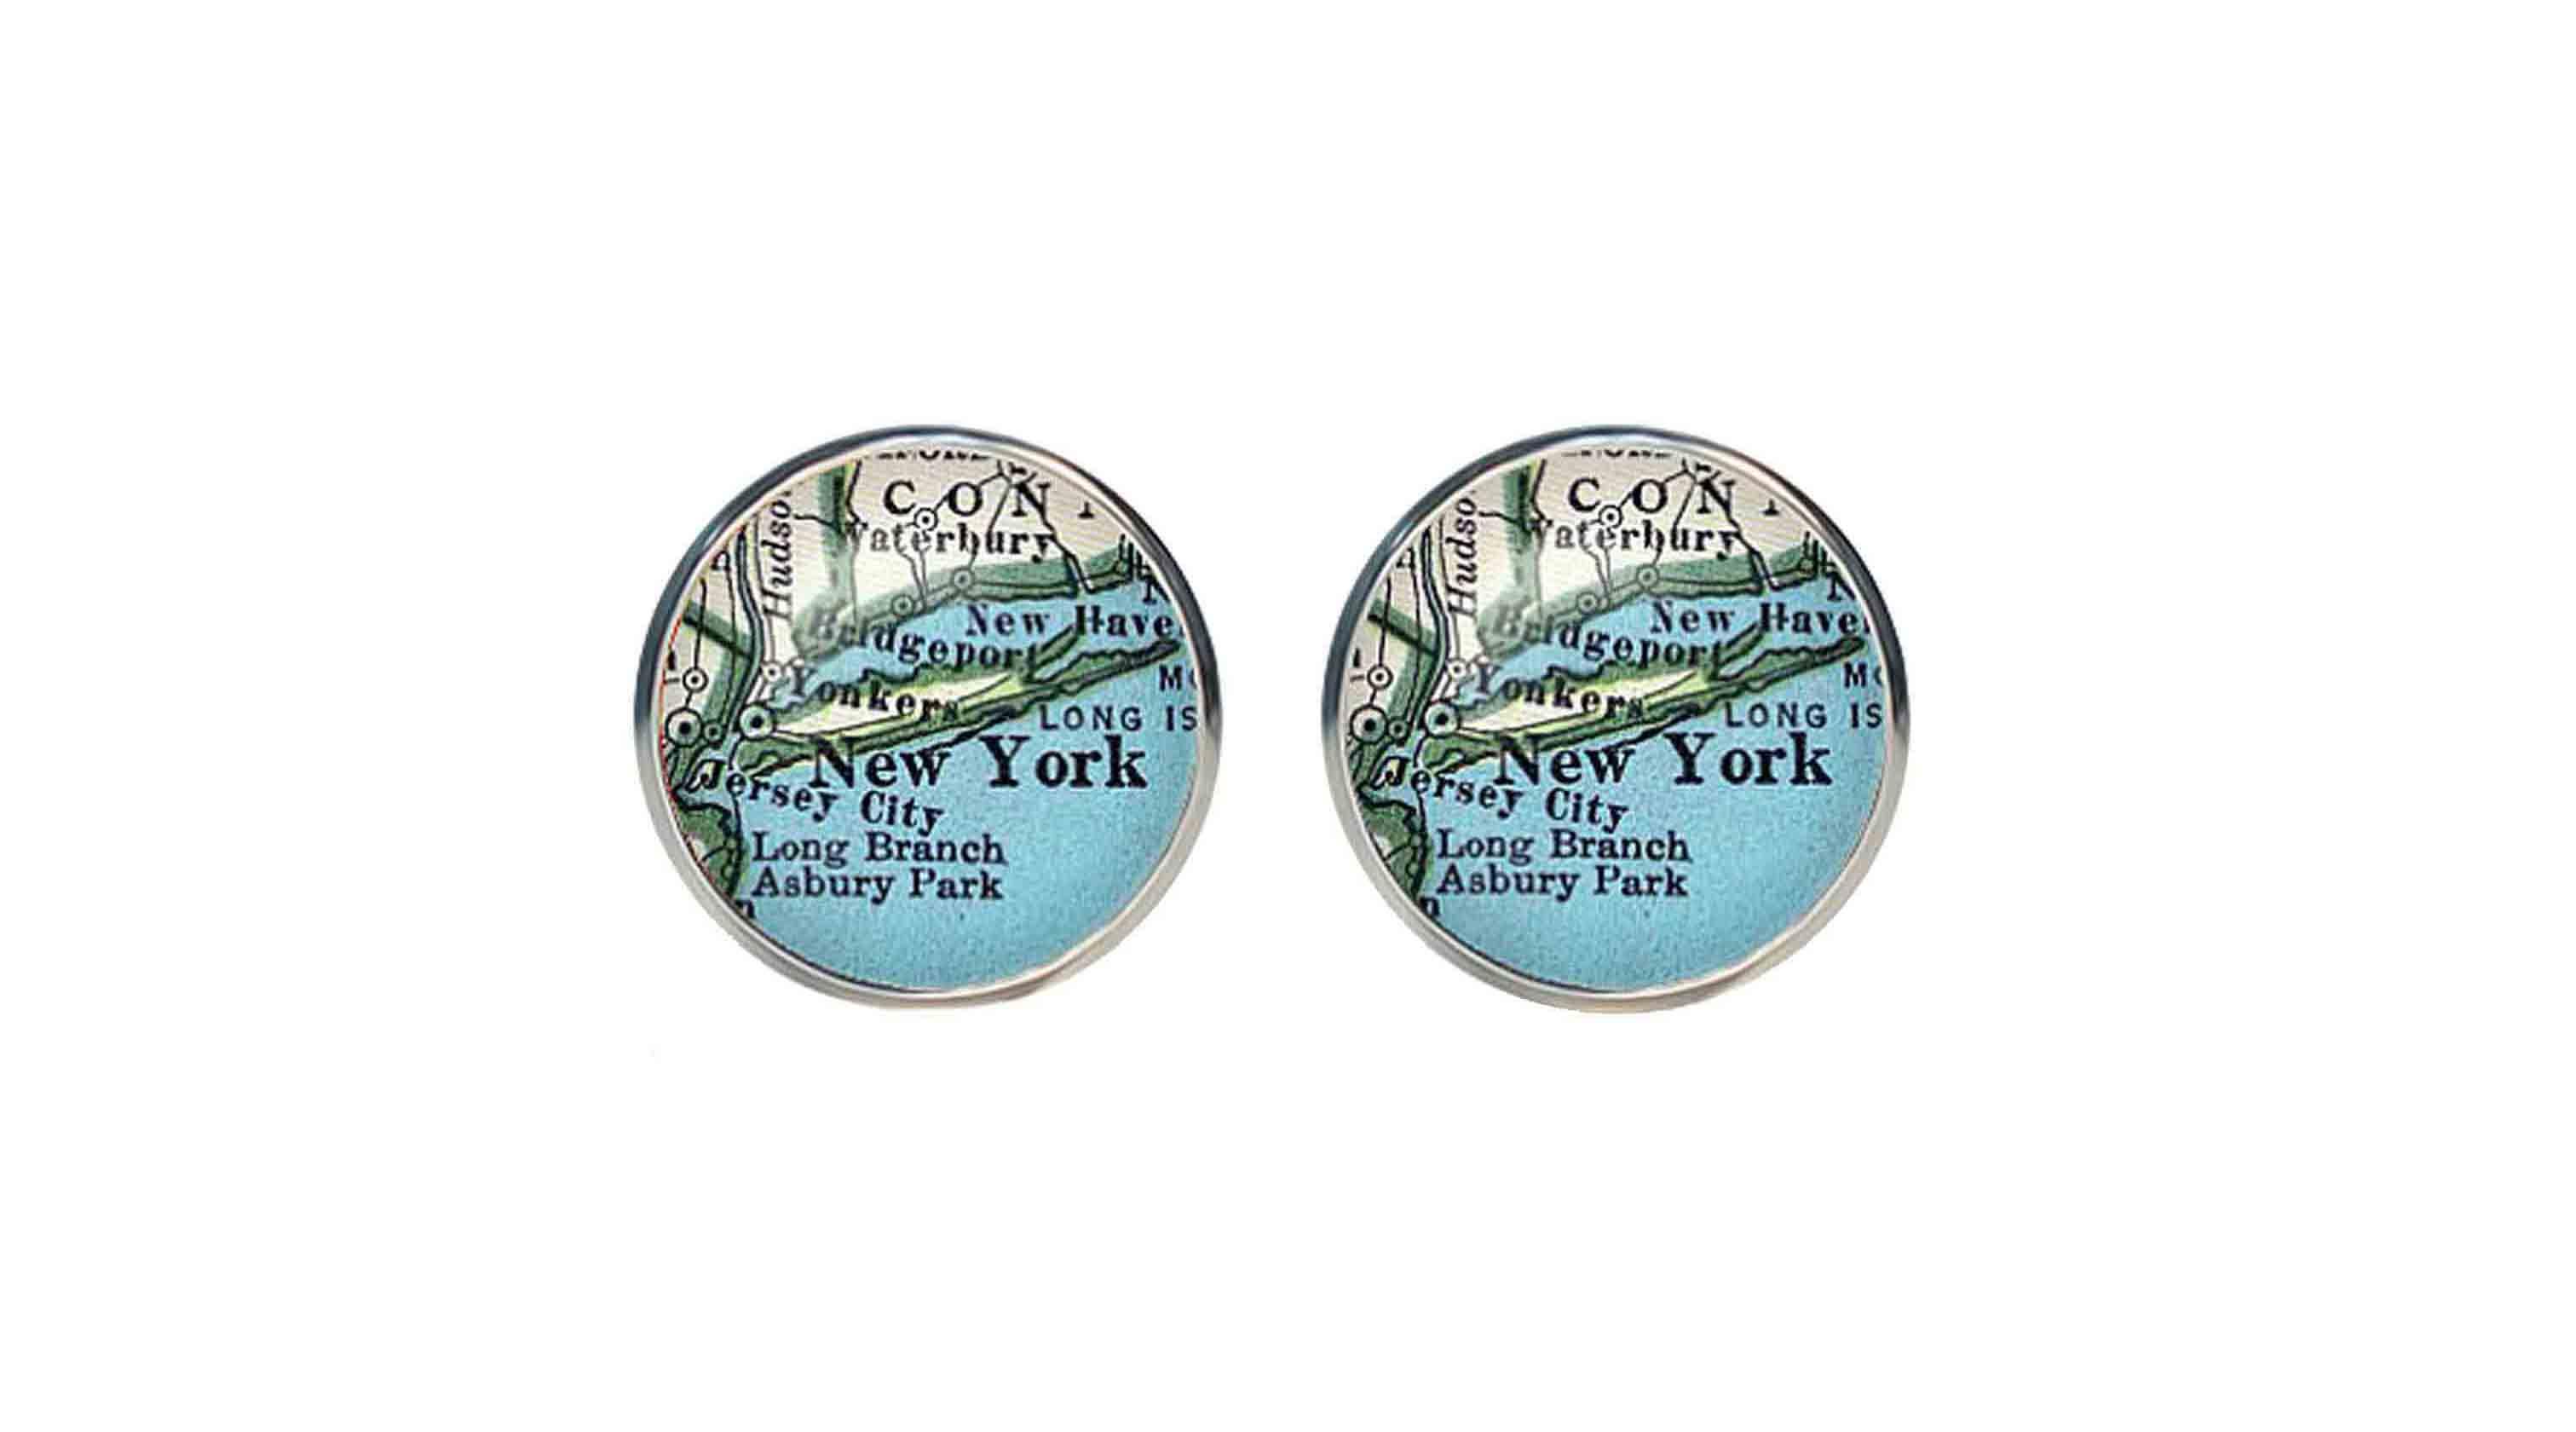 Old American New York City Map Cufflinks Silver Metal Alloy Men's